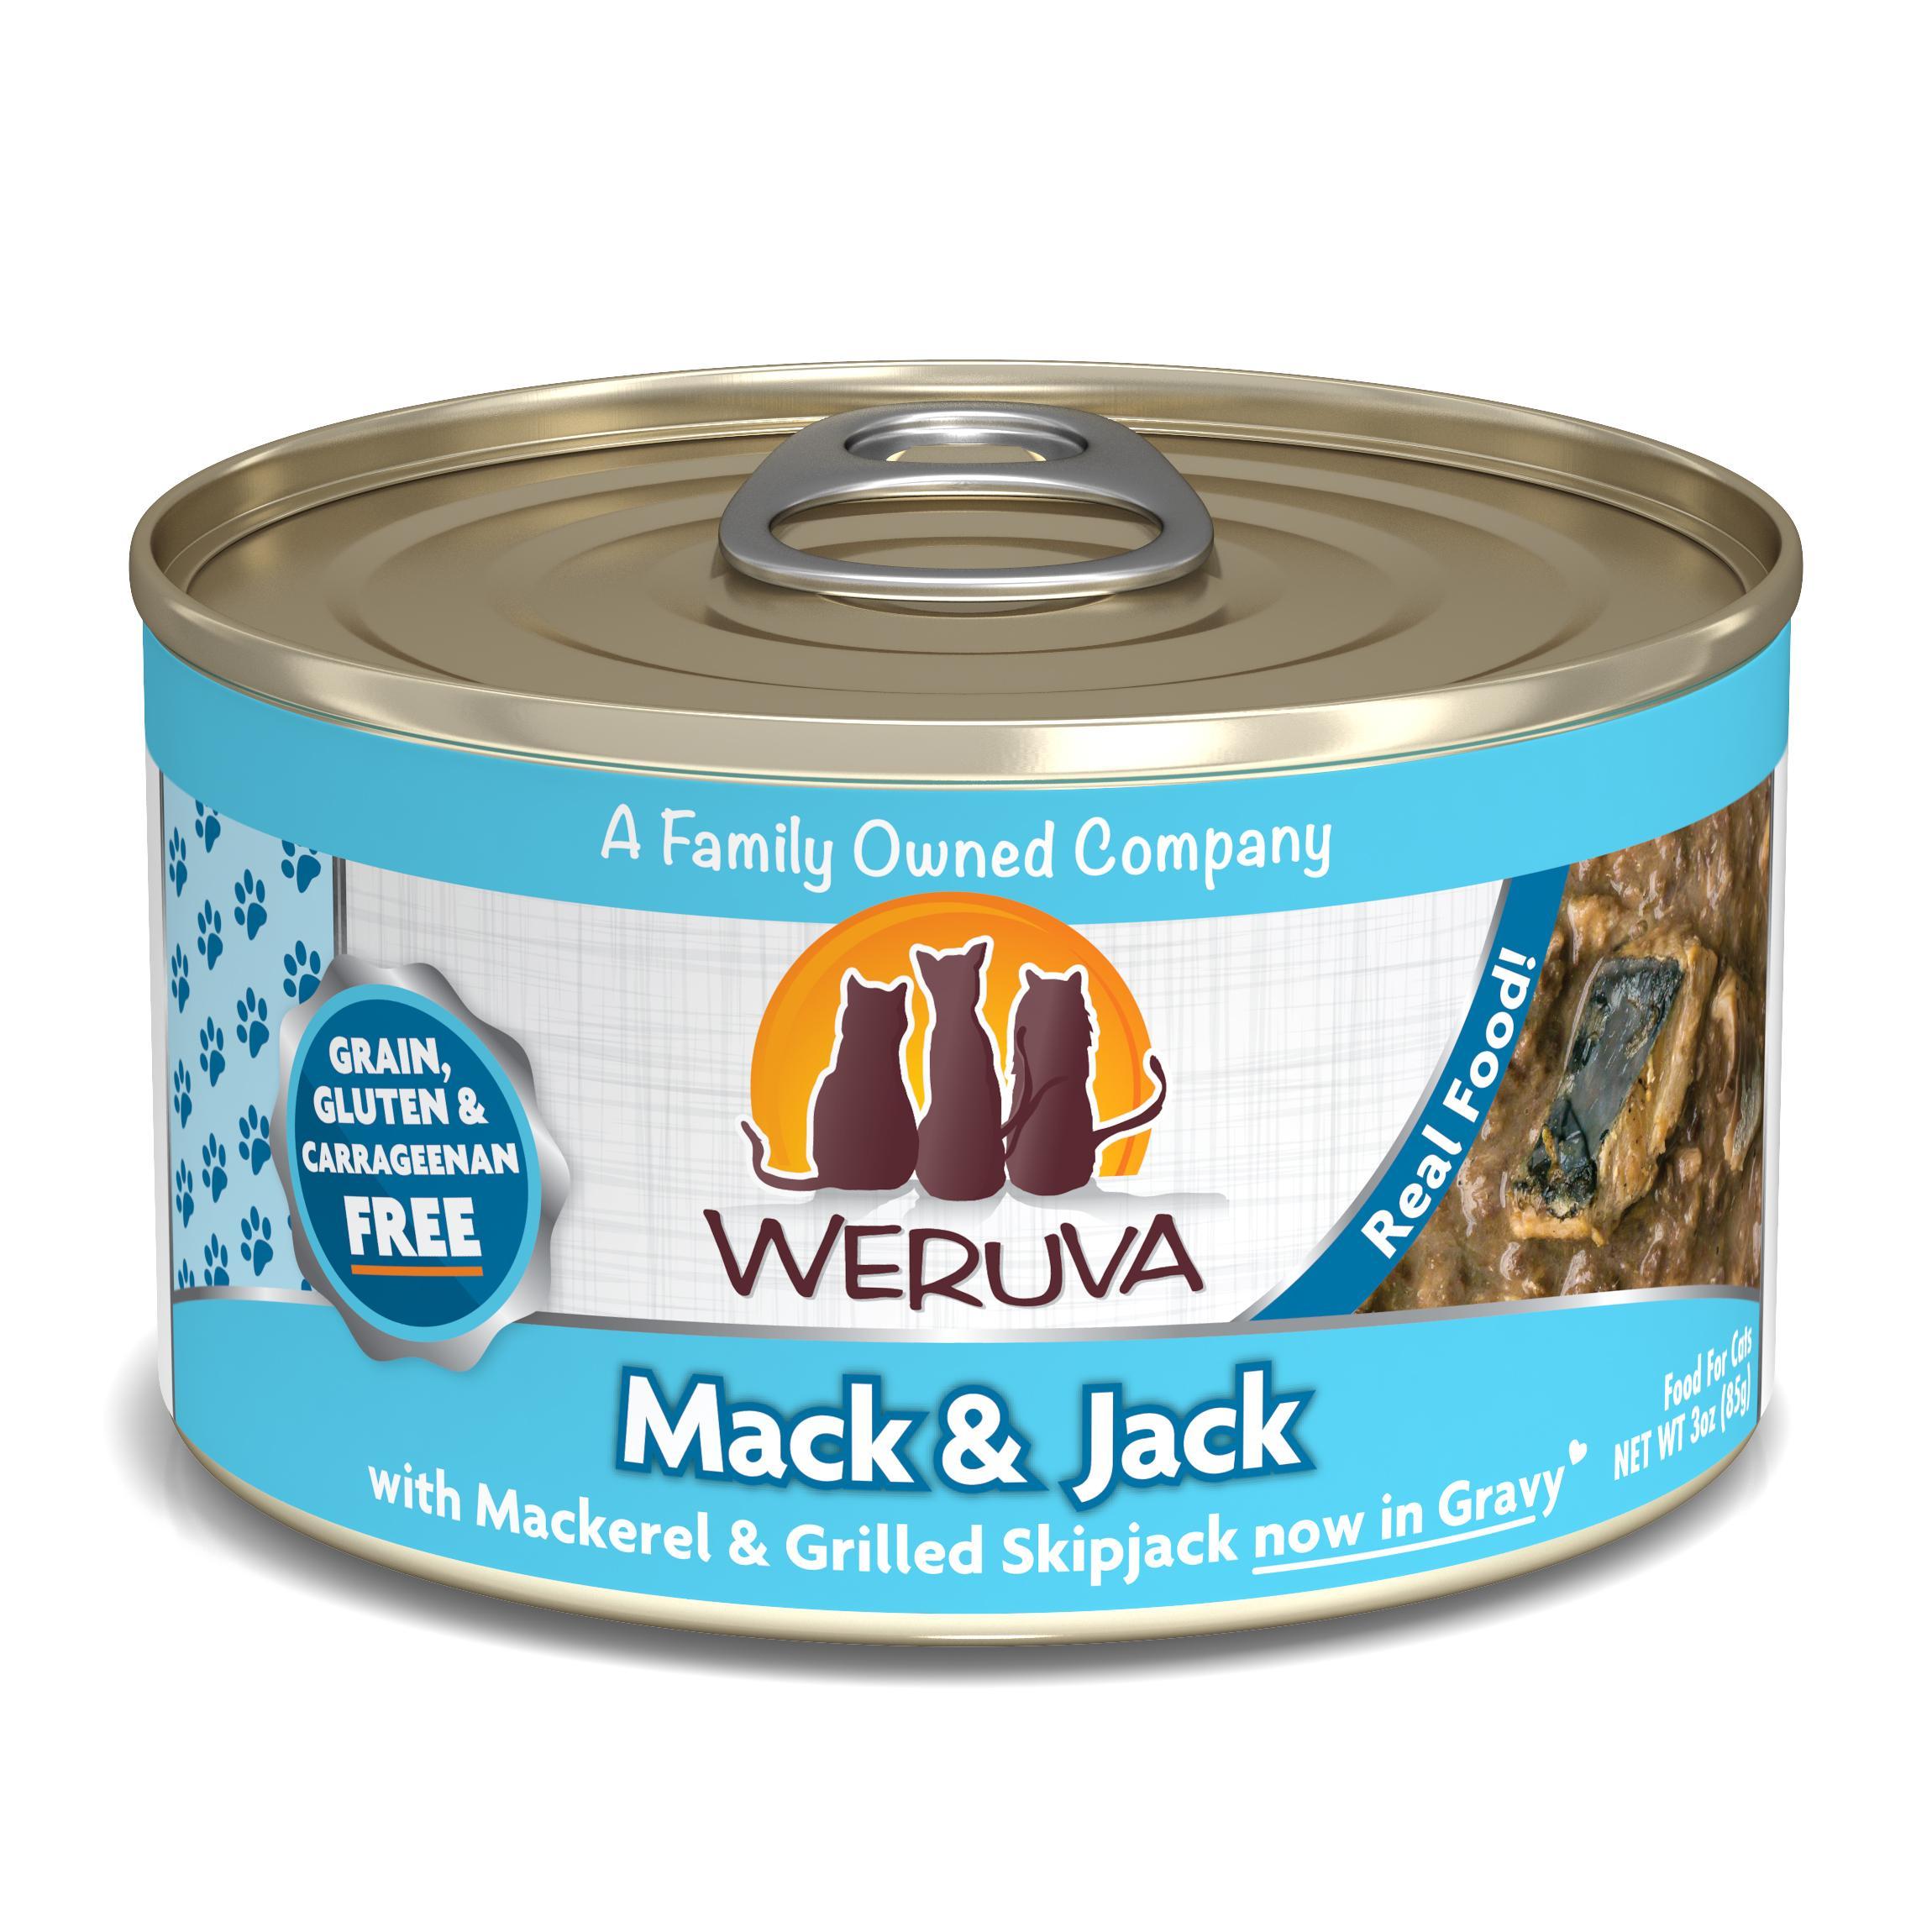 Weruva Cat Classic Mack and Jack with Mackerel & Grilled Skipjack Grain-Free Wet Cat Food, 3-oz